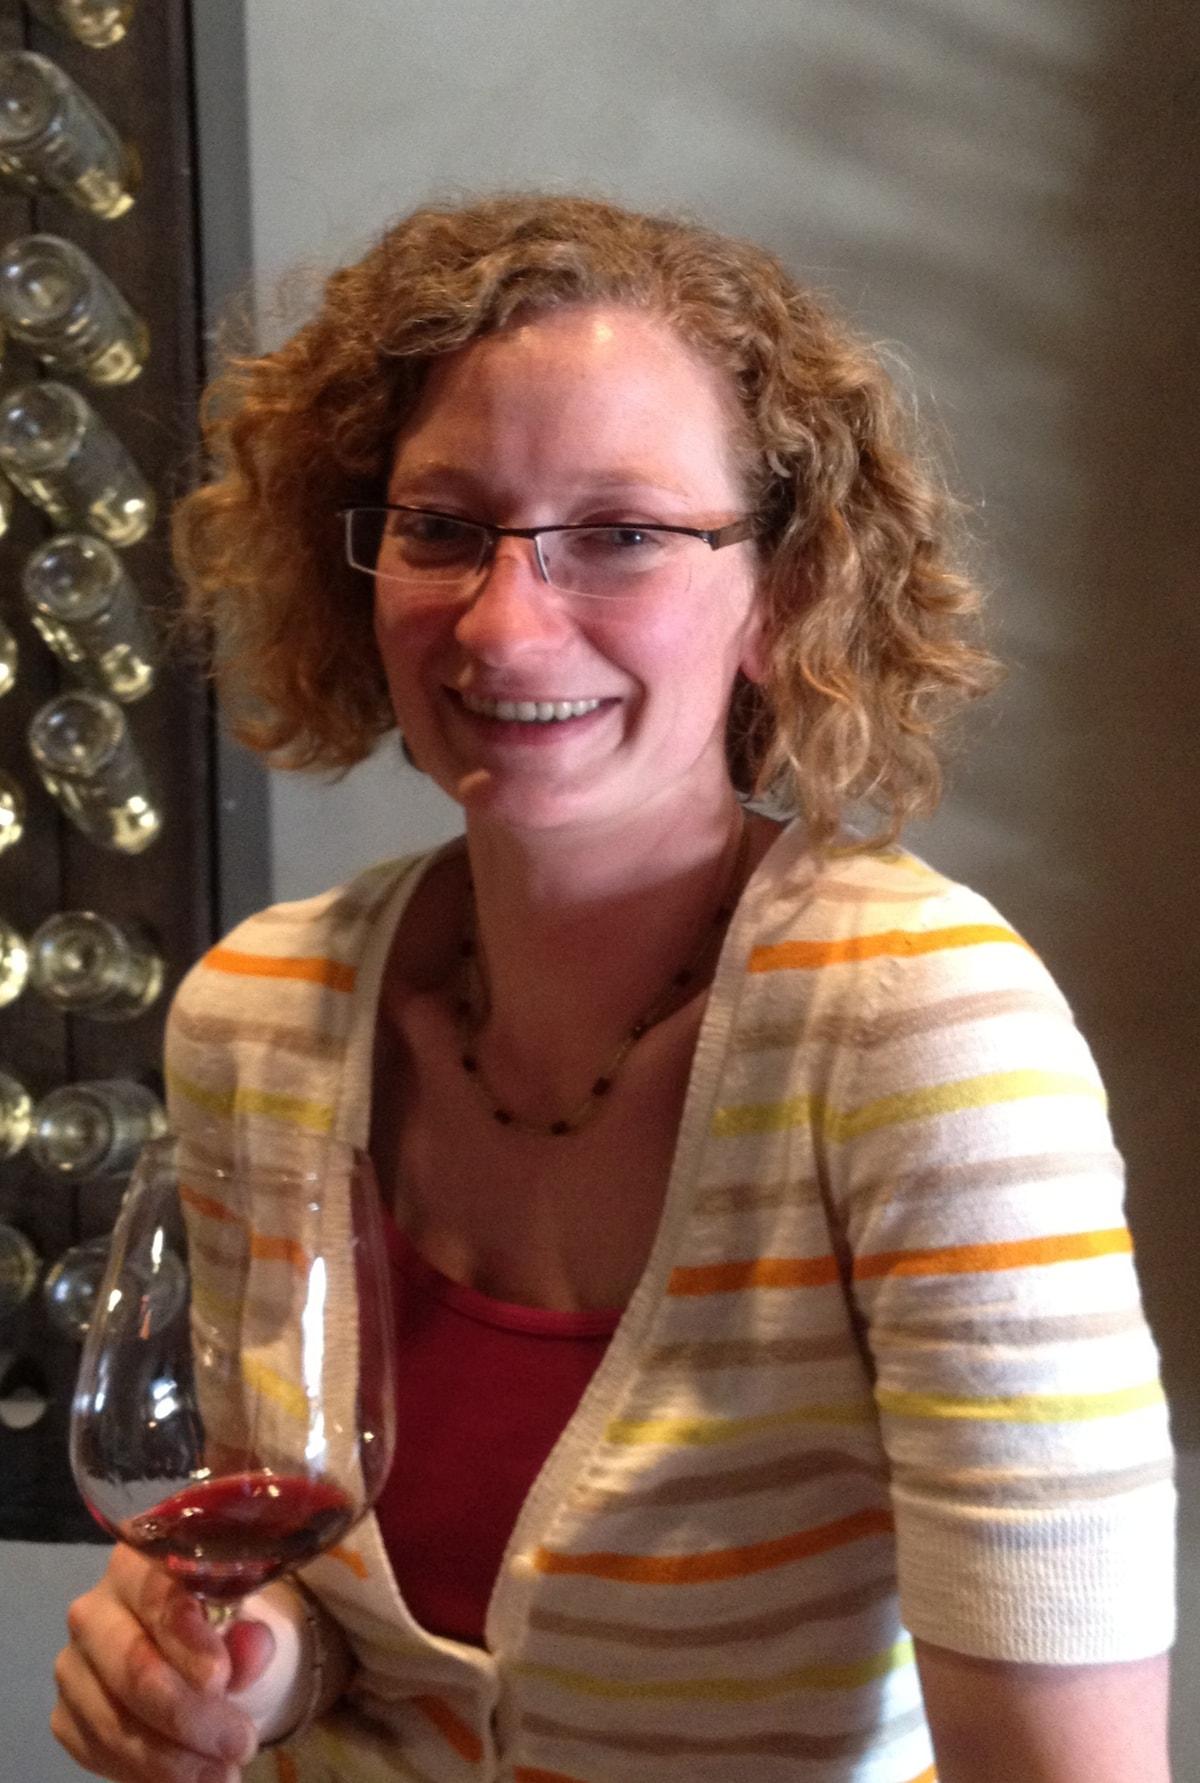 Joanna from Seattle